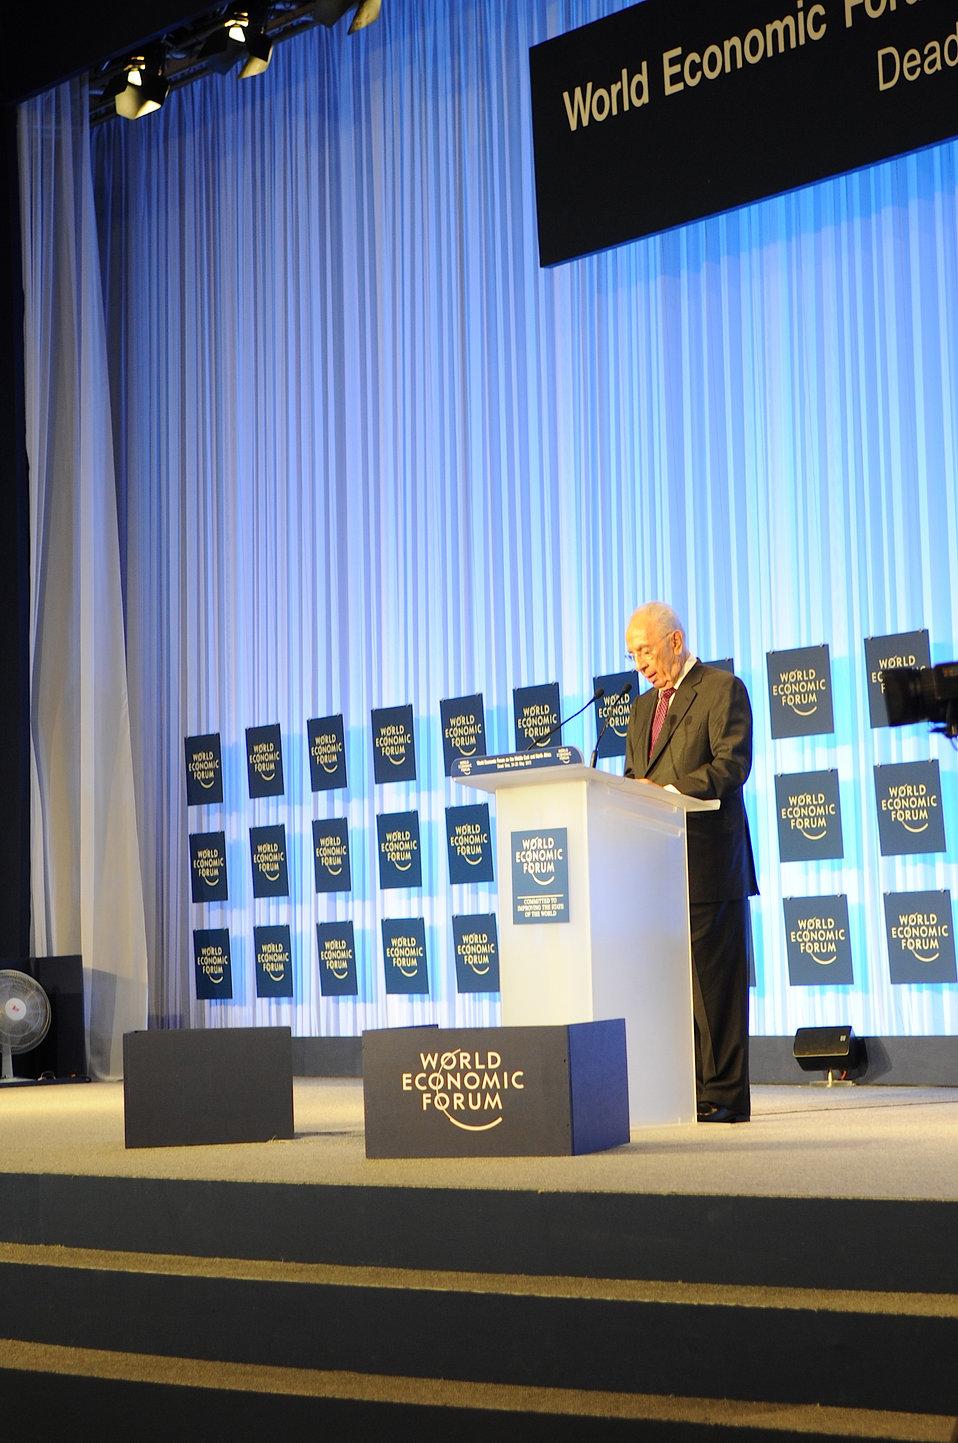 Israeli President Peres Addresses the World Economic Forum